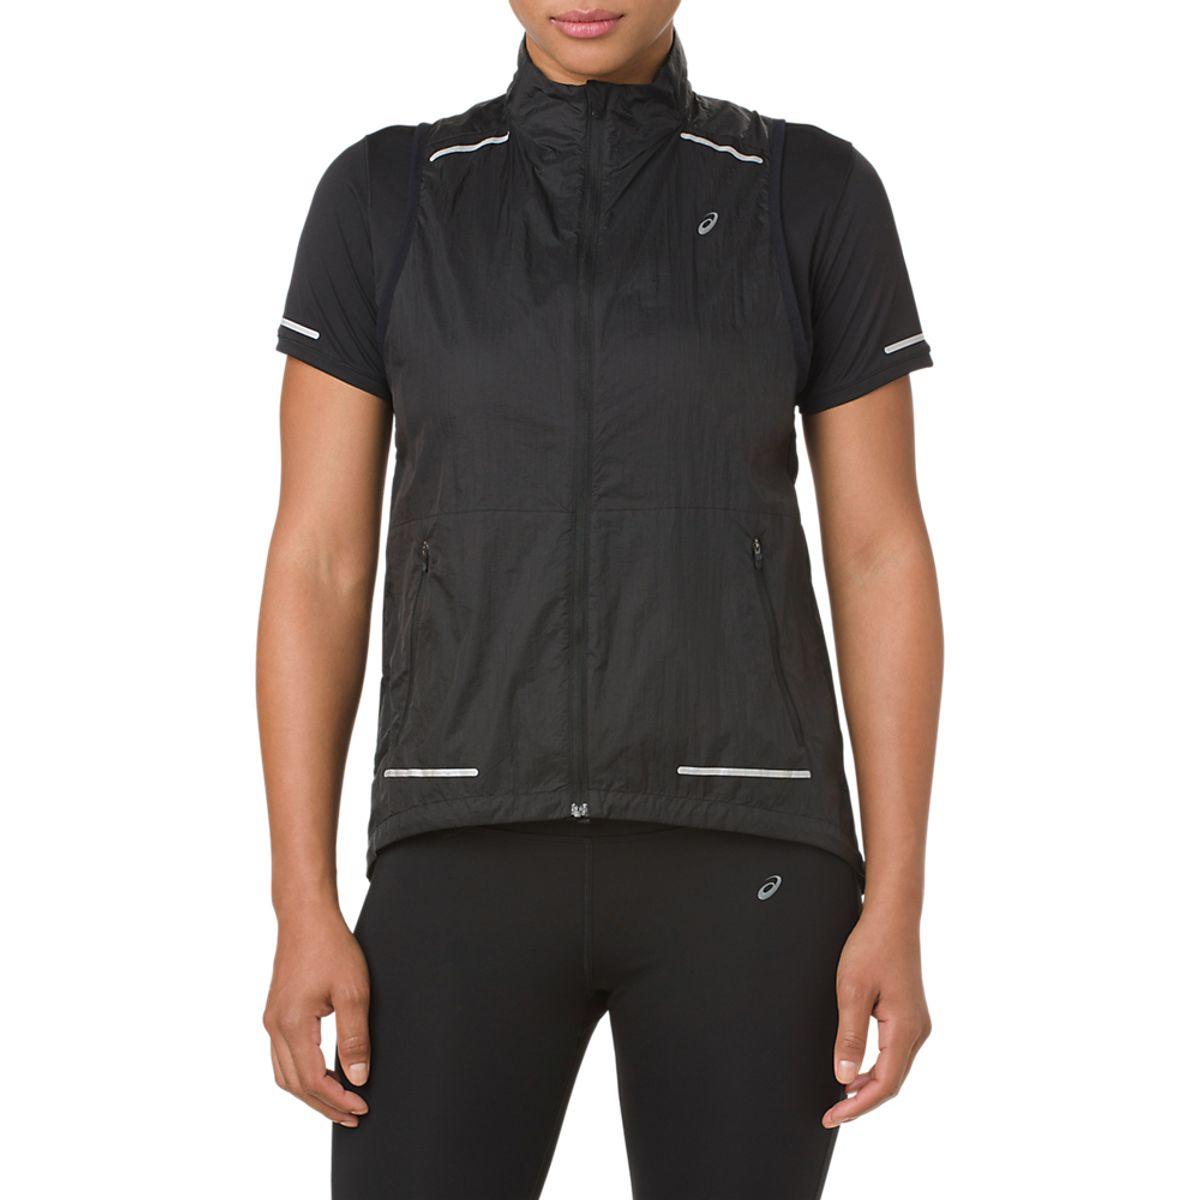 Jaqueta-Asics-Vest---Feminino---Preto